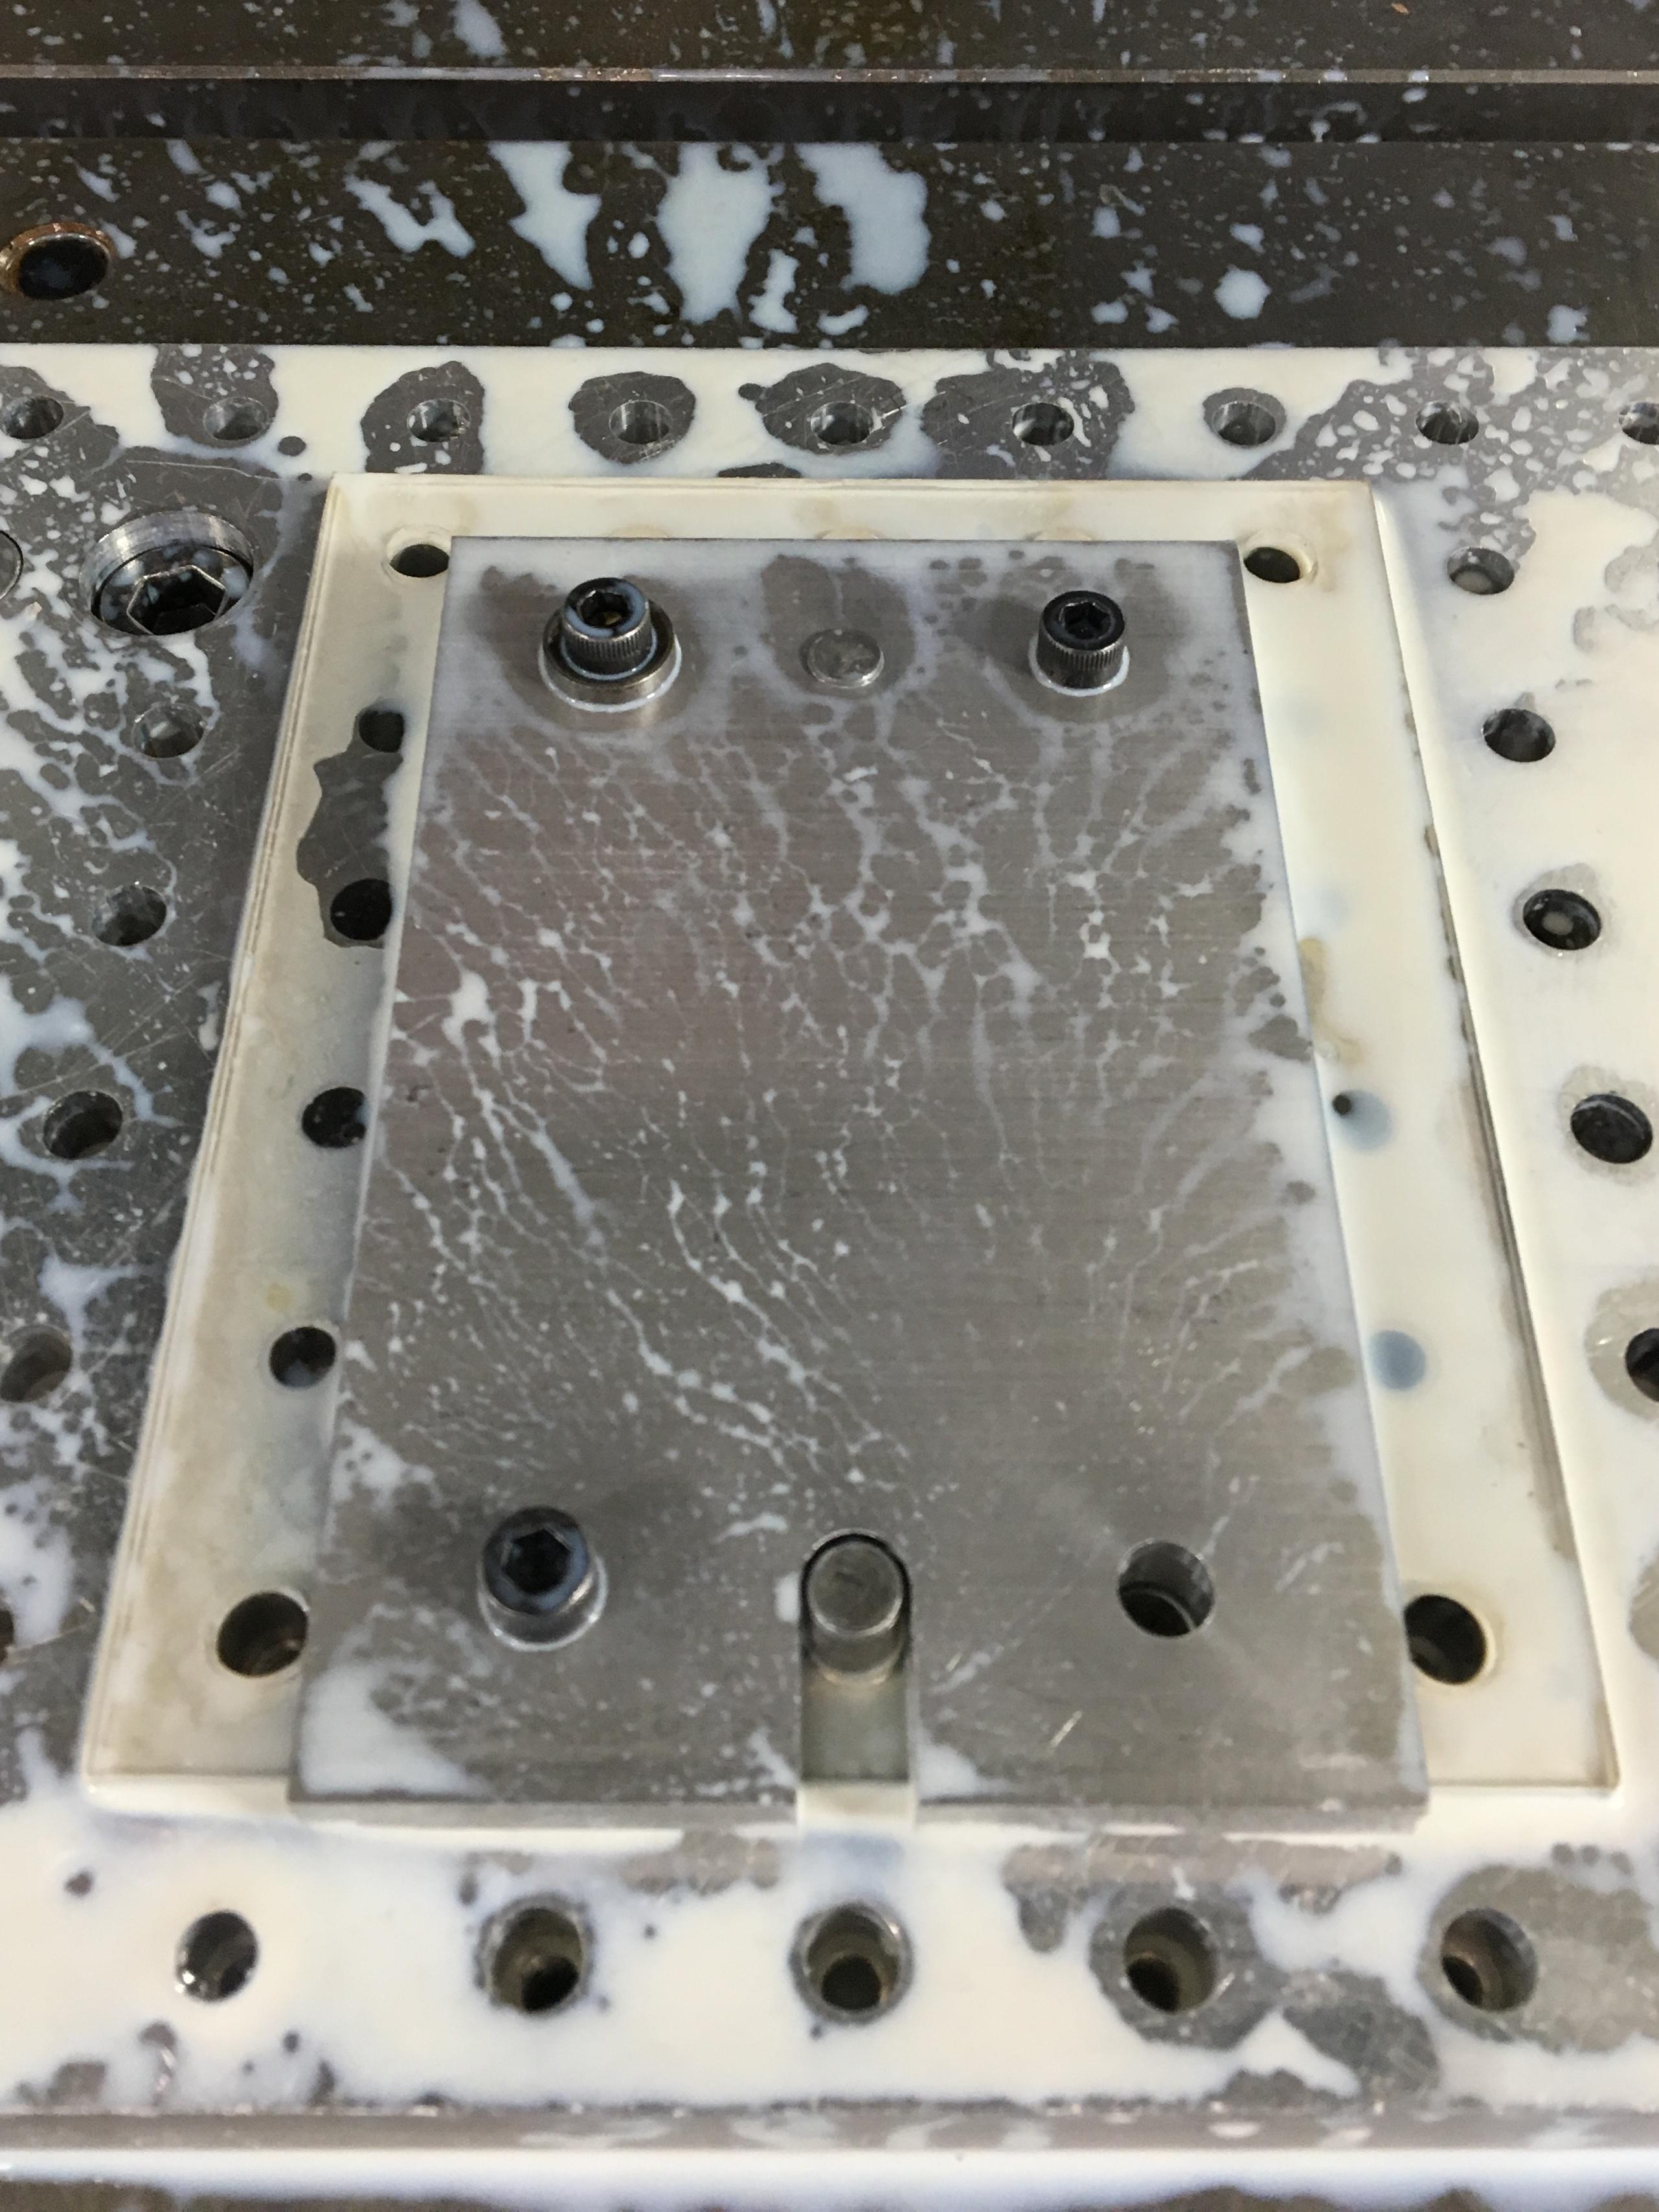 Aluminum stock fixtured within CNC